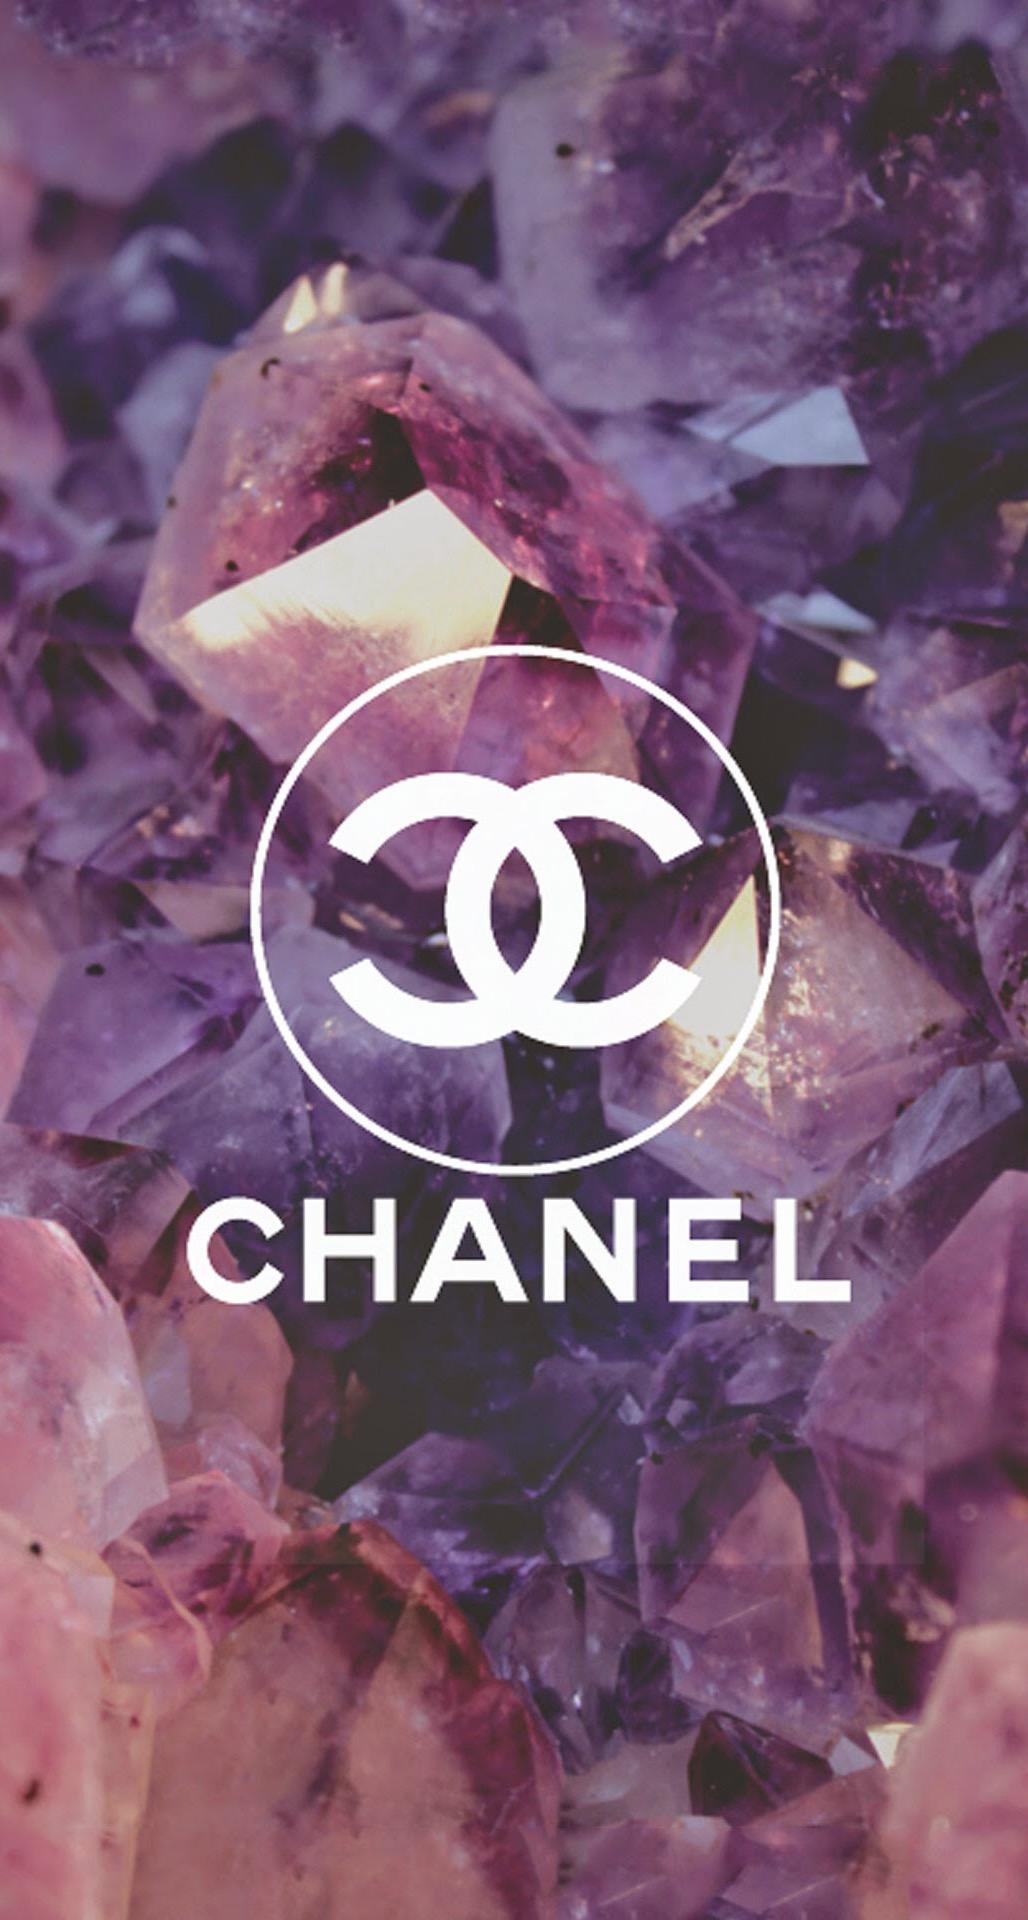 Chanel Logo Diamonds iPhone 6 Plus HD Wallpaper iPod Wallpaper HD 1028x1920